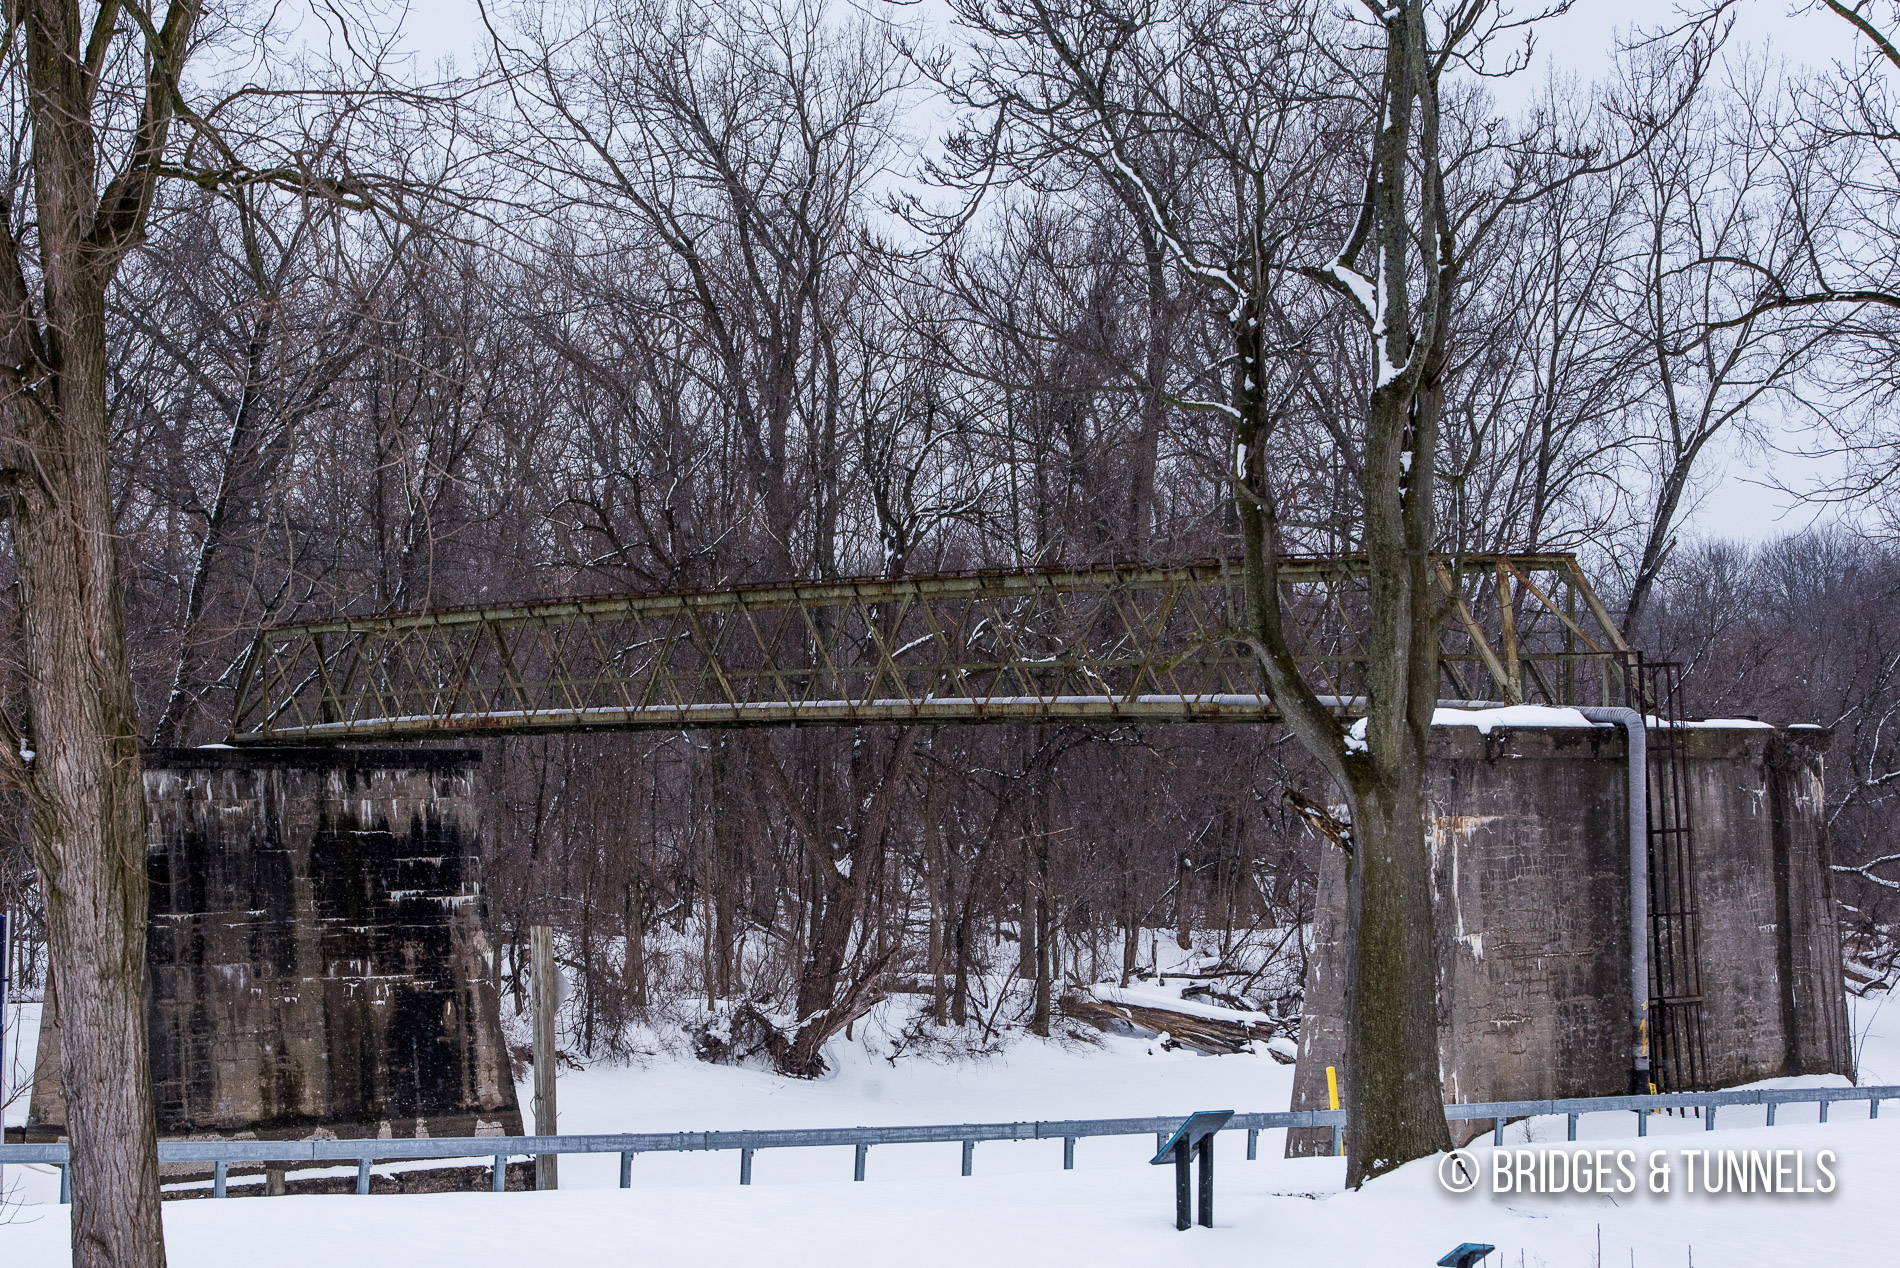 Rochester, Syracuse & Eastern interurban bridge